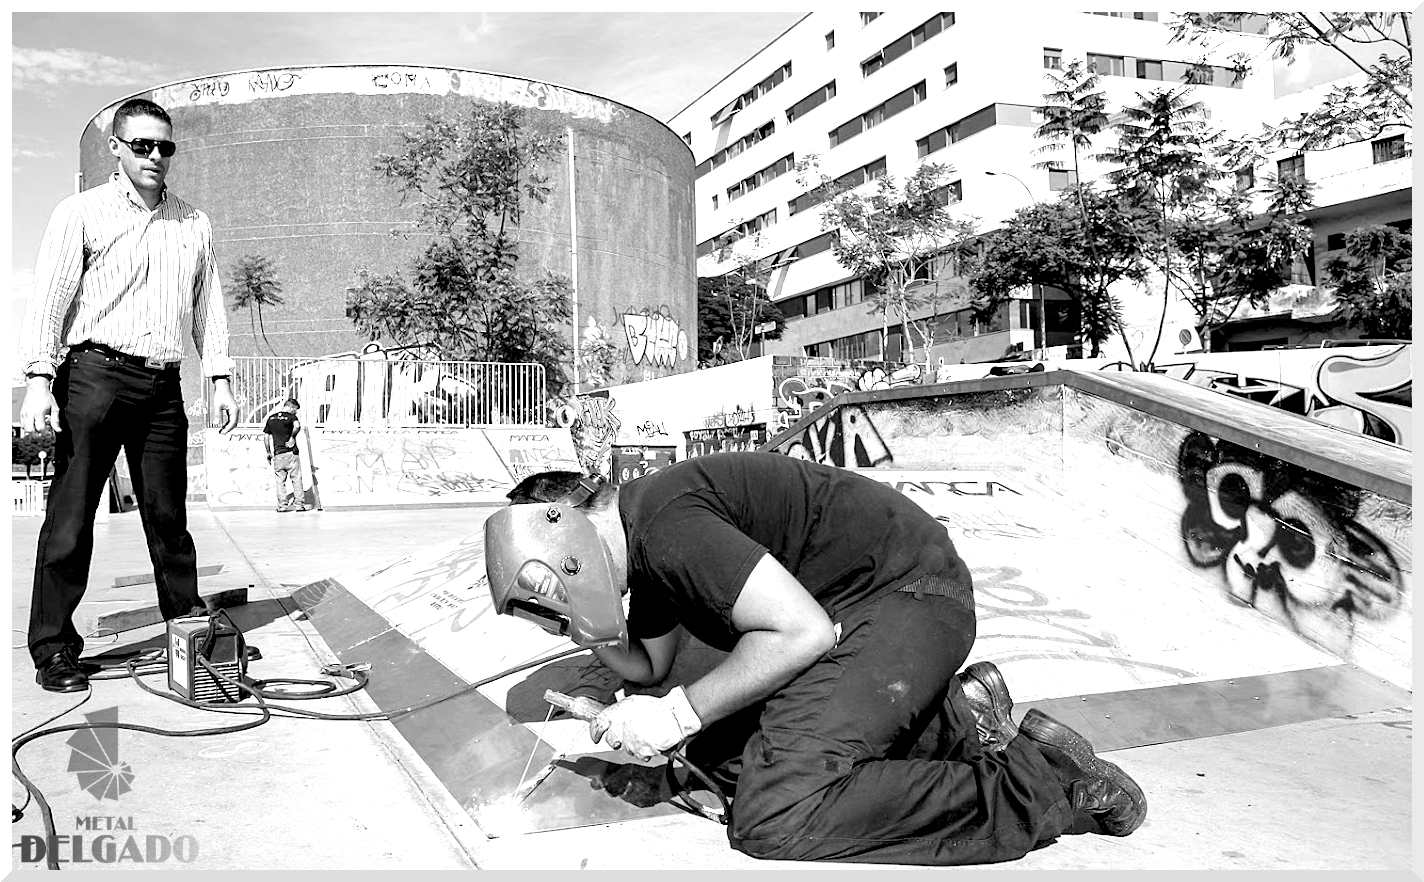 reparacion_skateboard_mantenimiento-tenerife